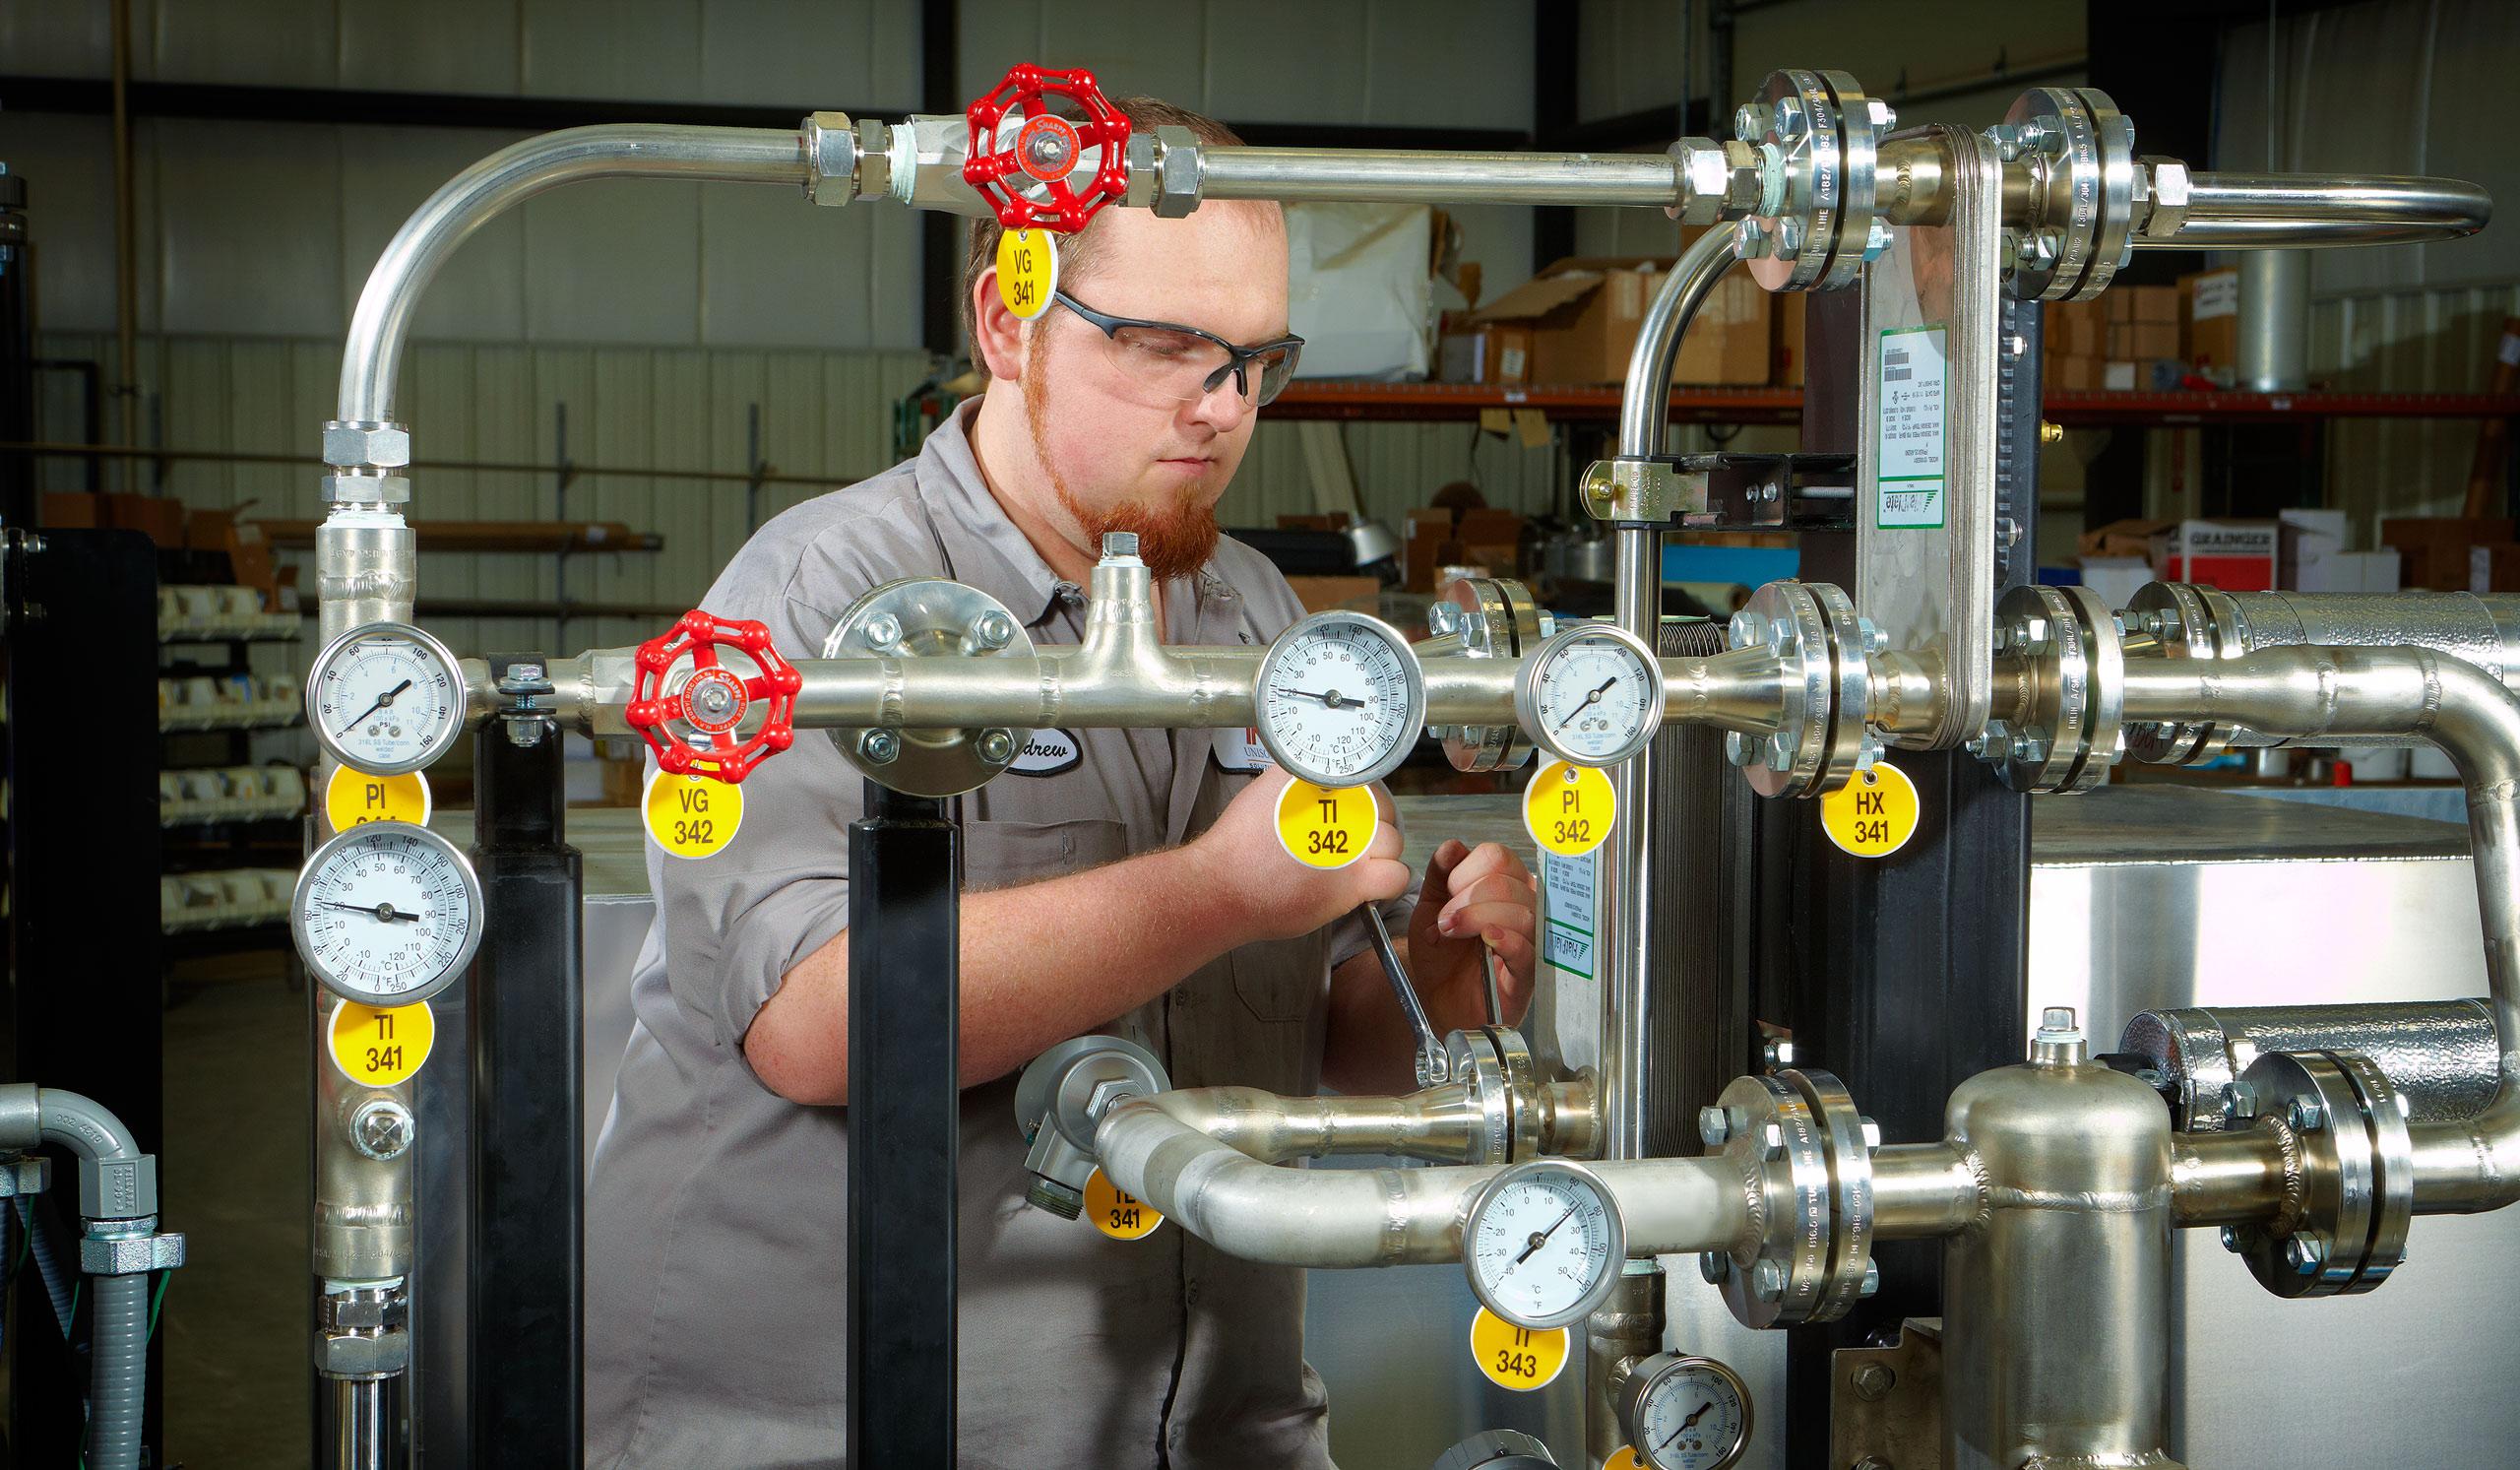 Installing gauges on biogas tanks at Unison Solutions